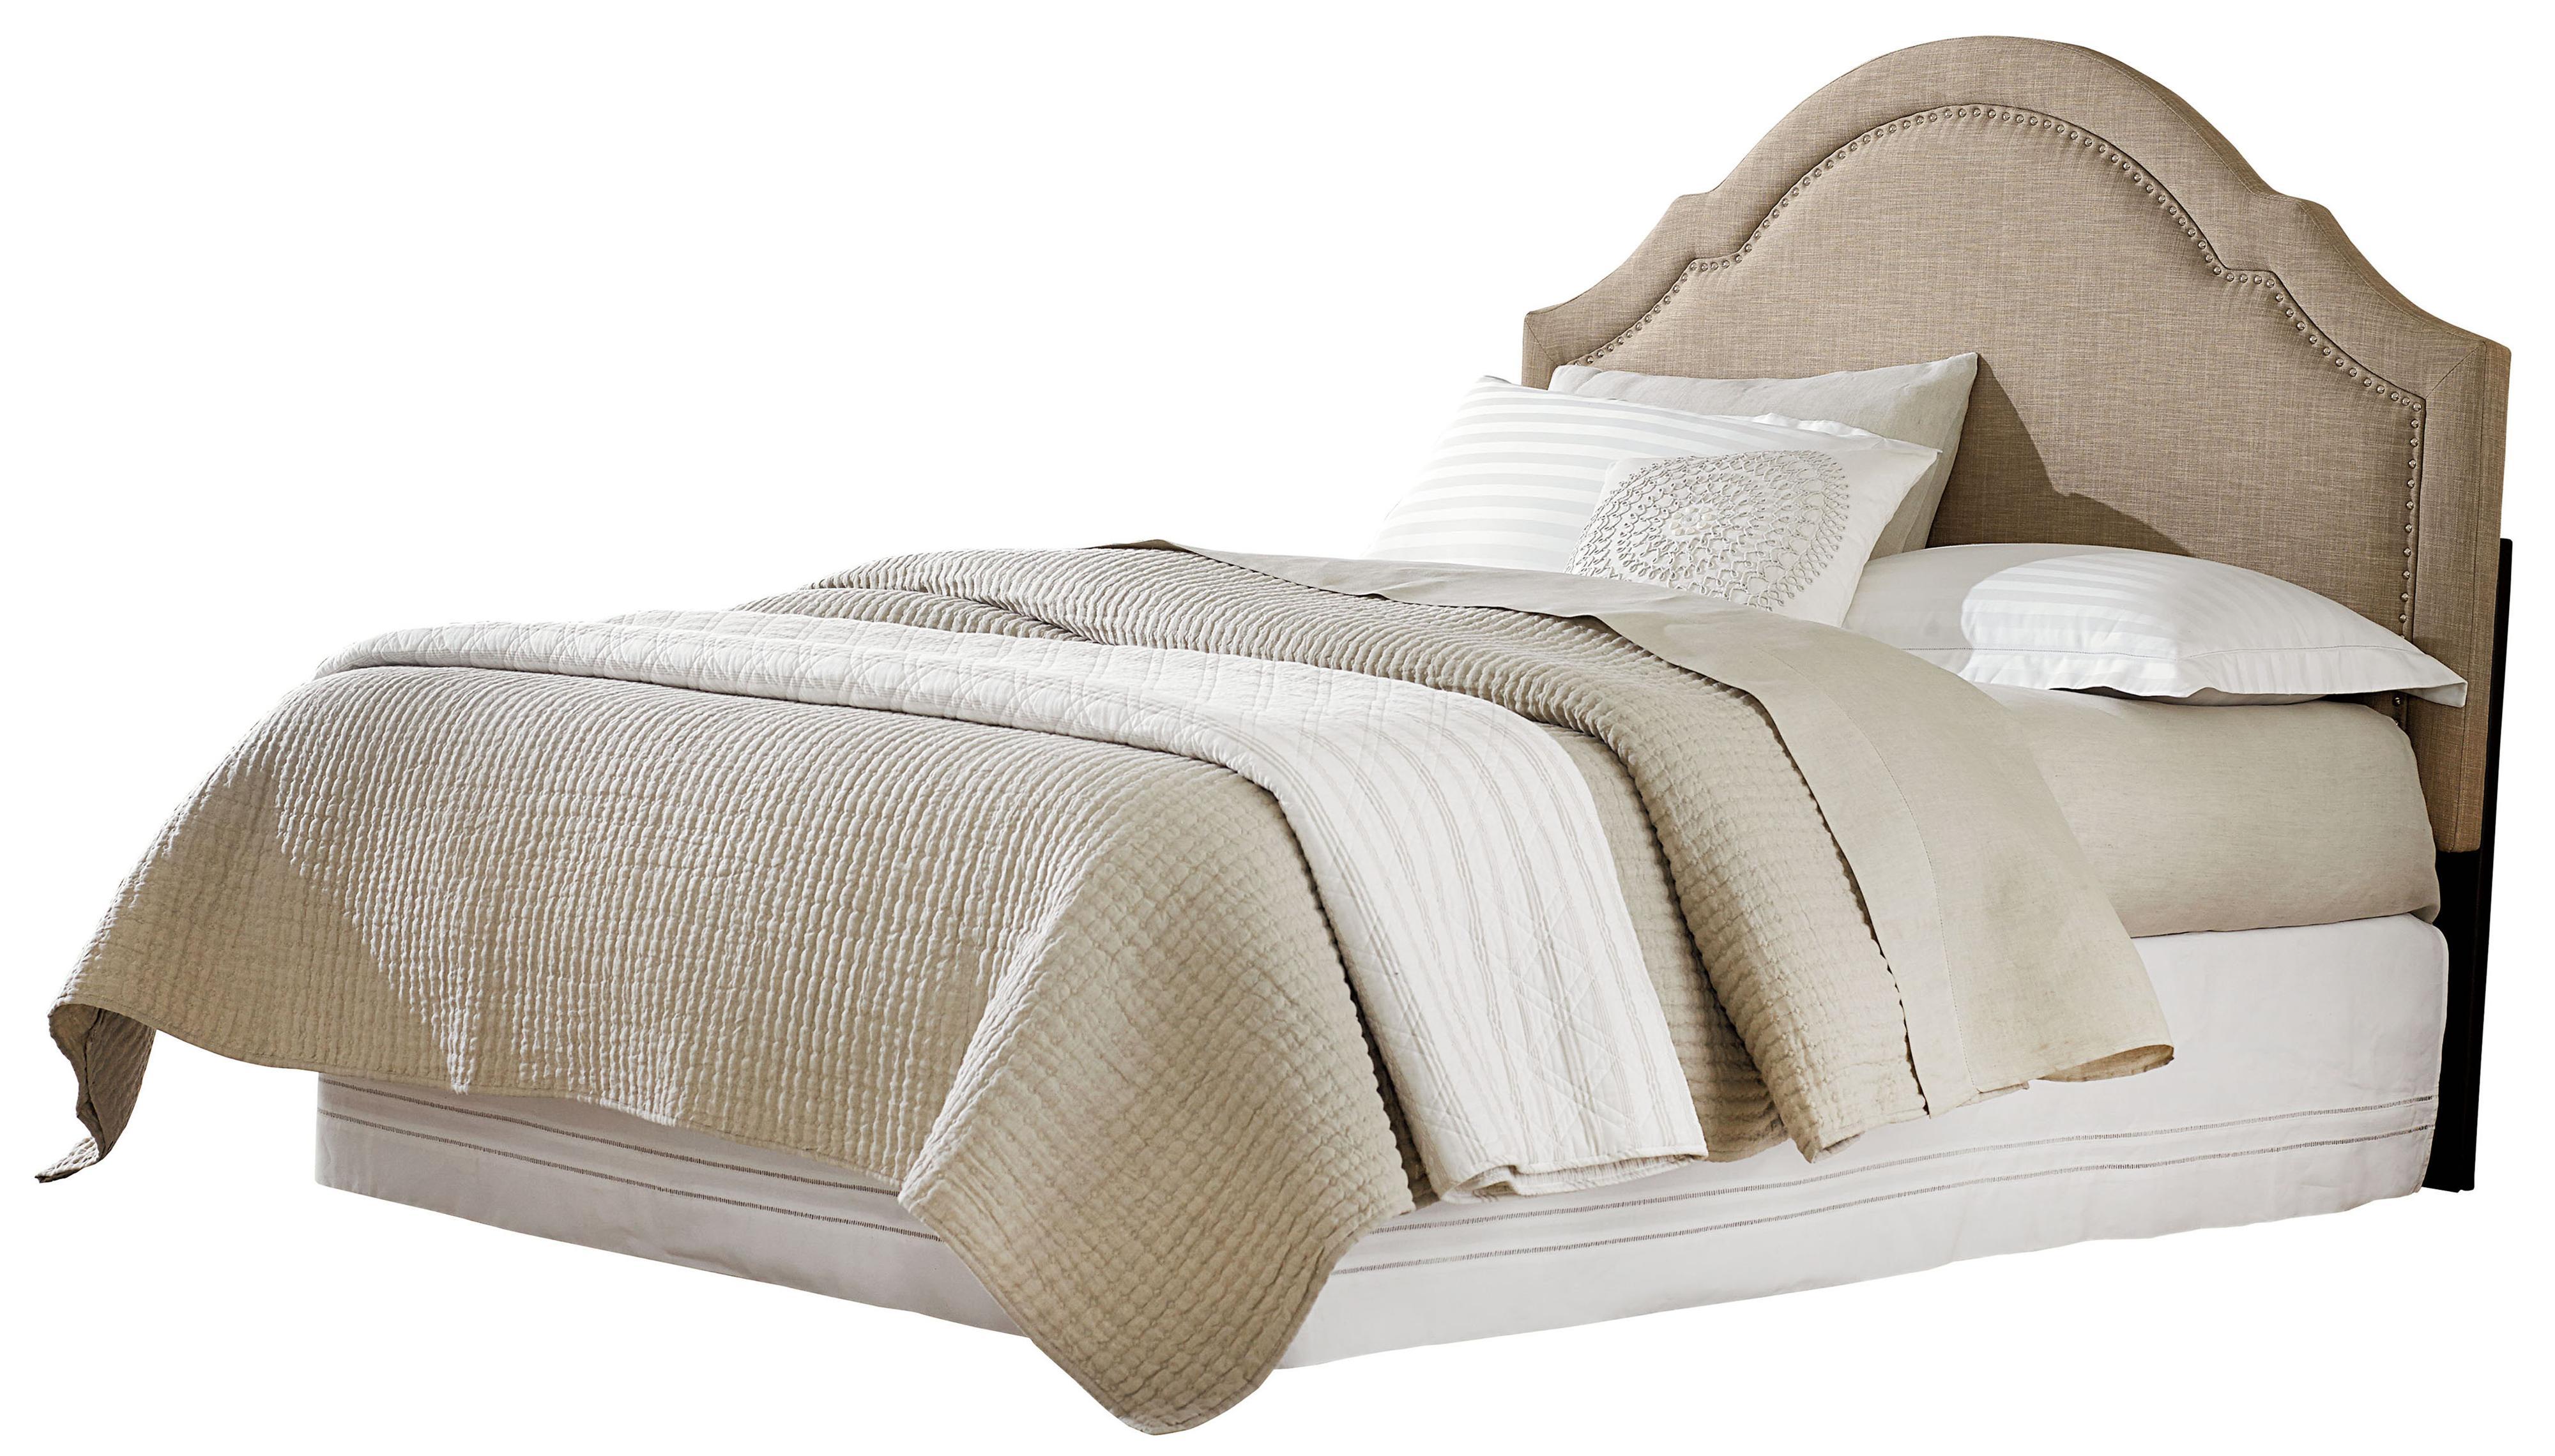 Standard Furniture Simplicity Queen Headboard - Item Number: 81652